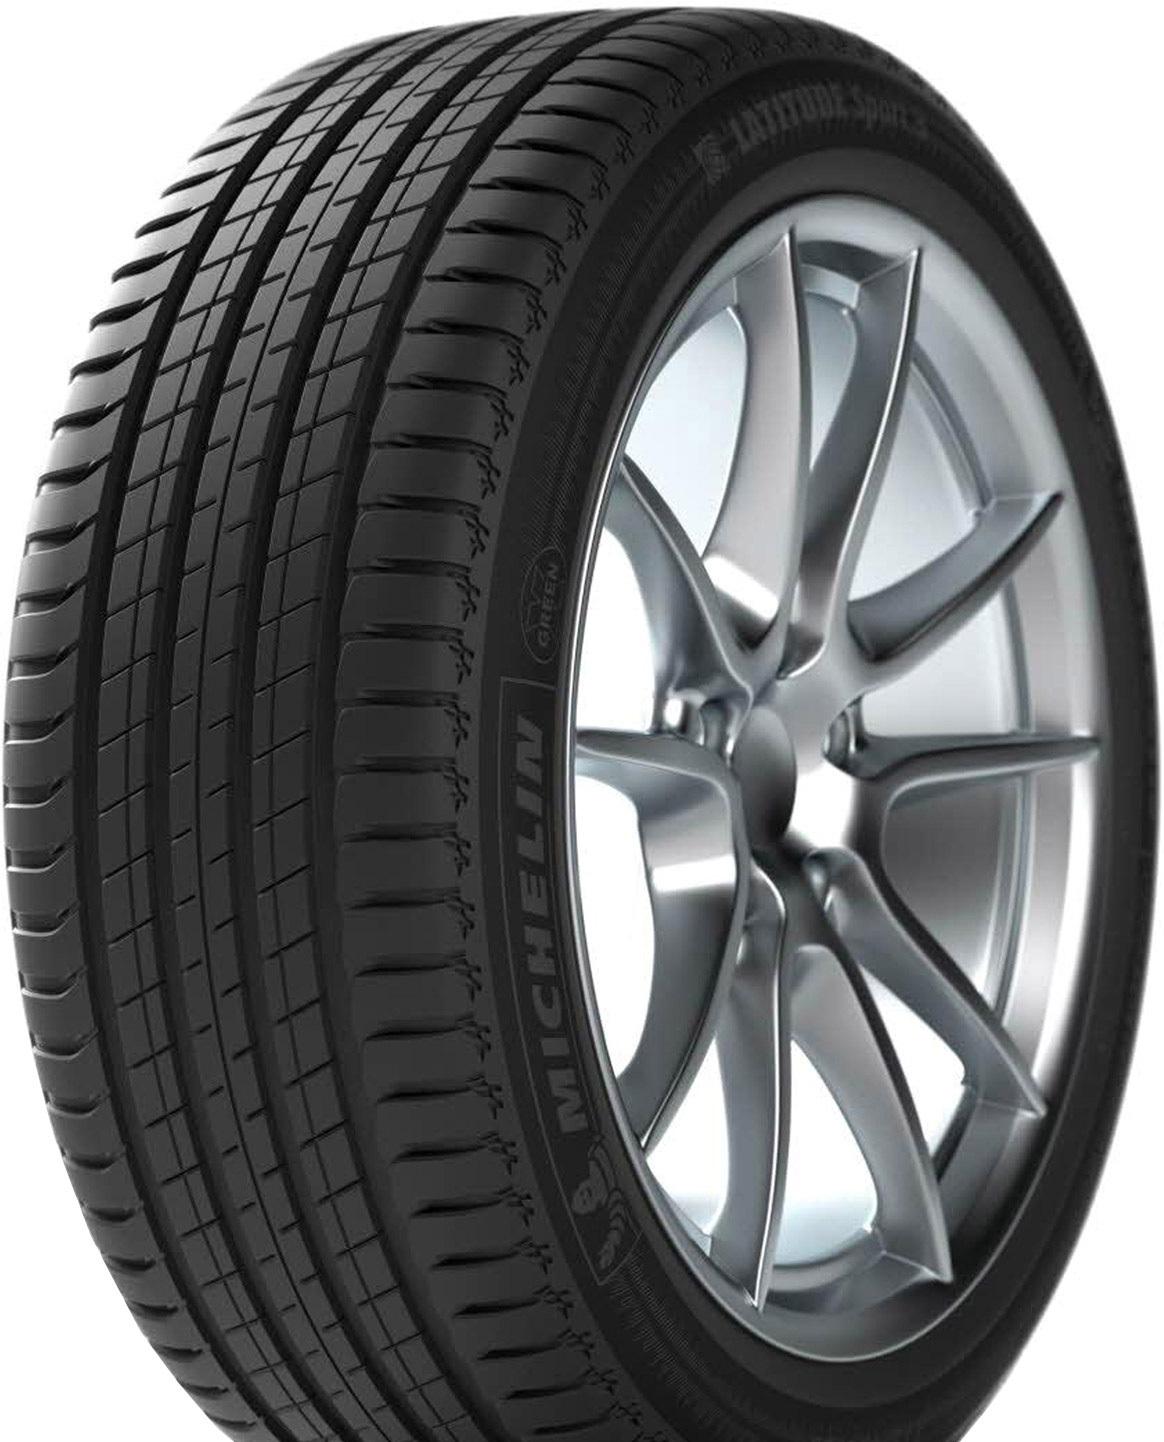 Автомобильные шины Michelin Latitude Sport 3 235/55R18 100V